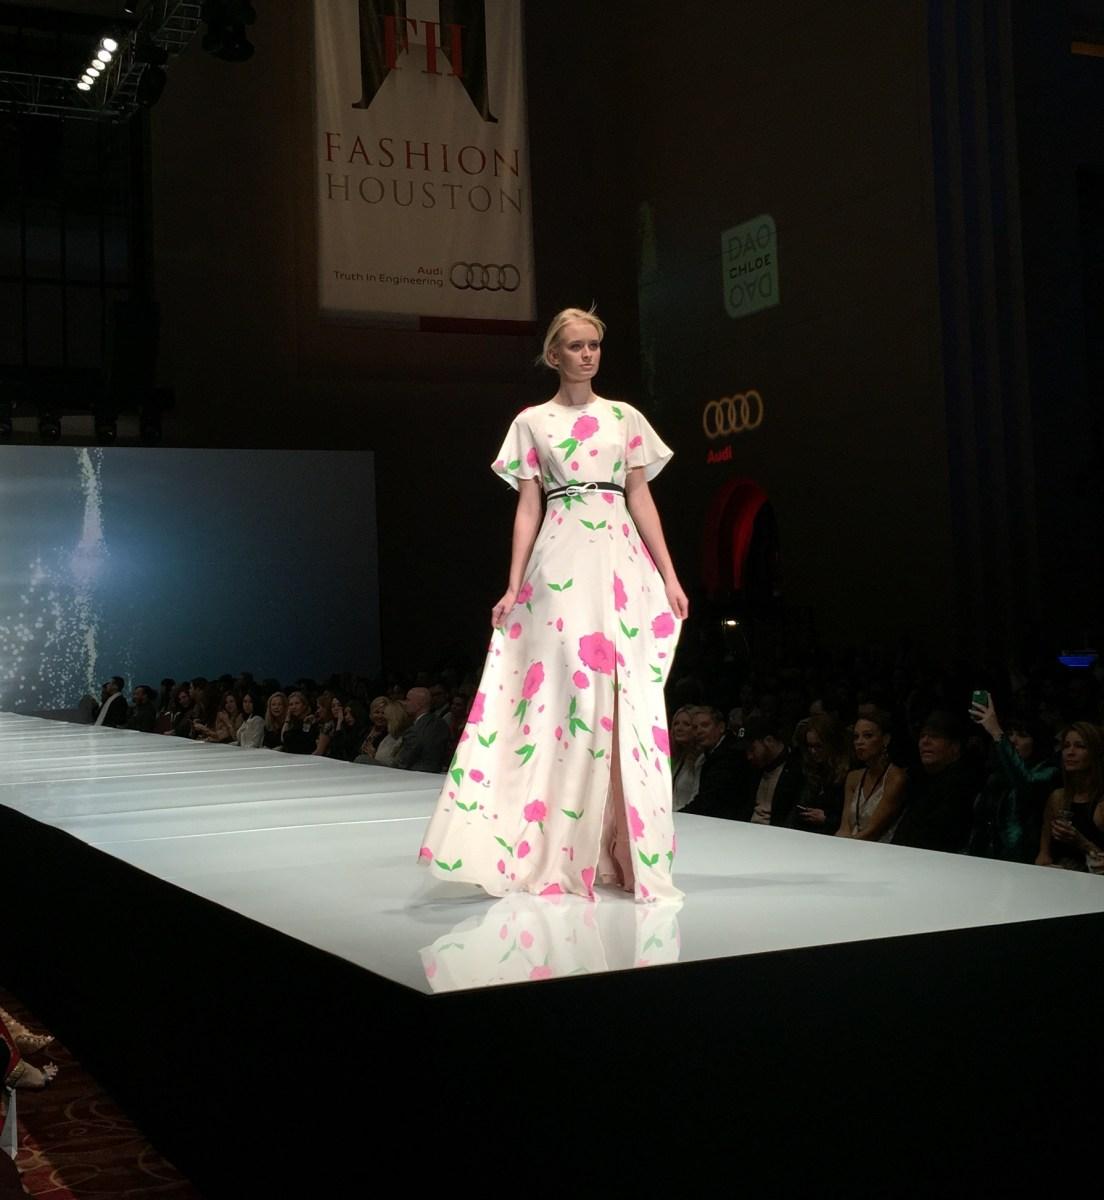 Chloe Dao at Fashion Houston 2014 | Wortham Center | Dresses by Chloe Dao Houston Fashion Designer